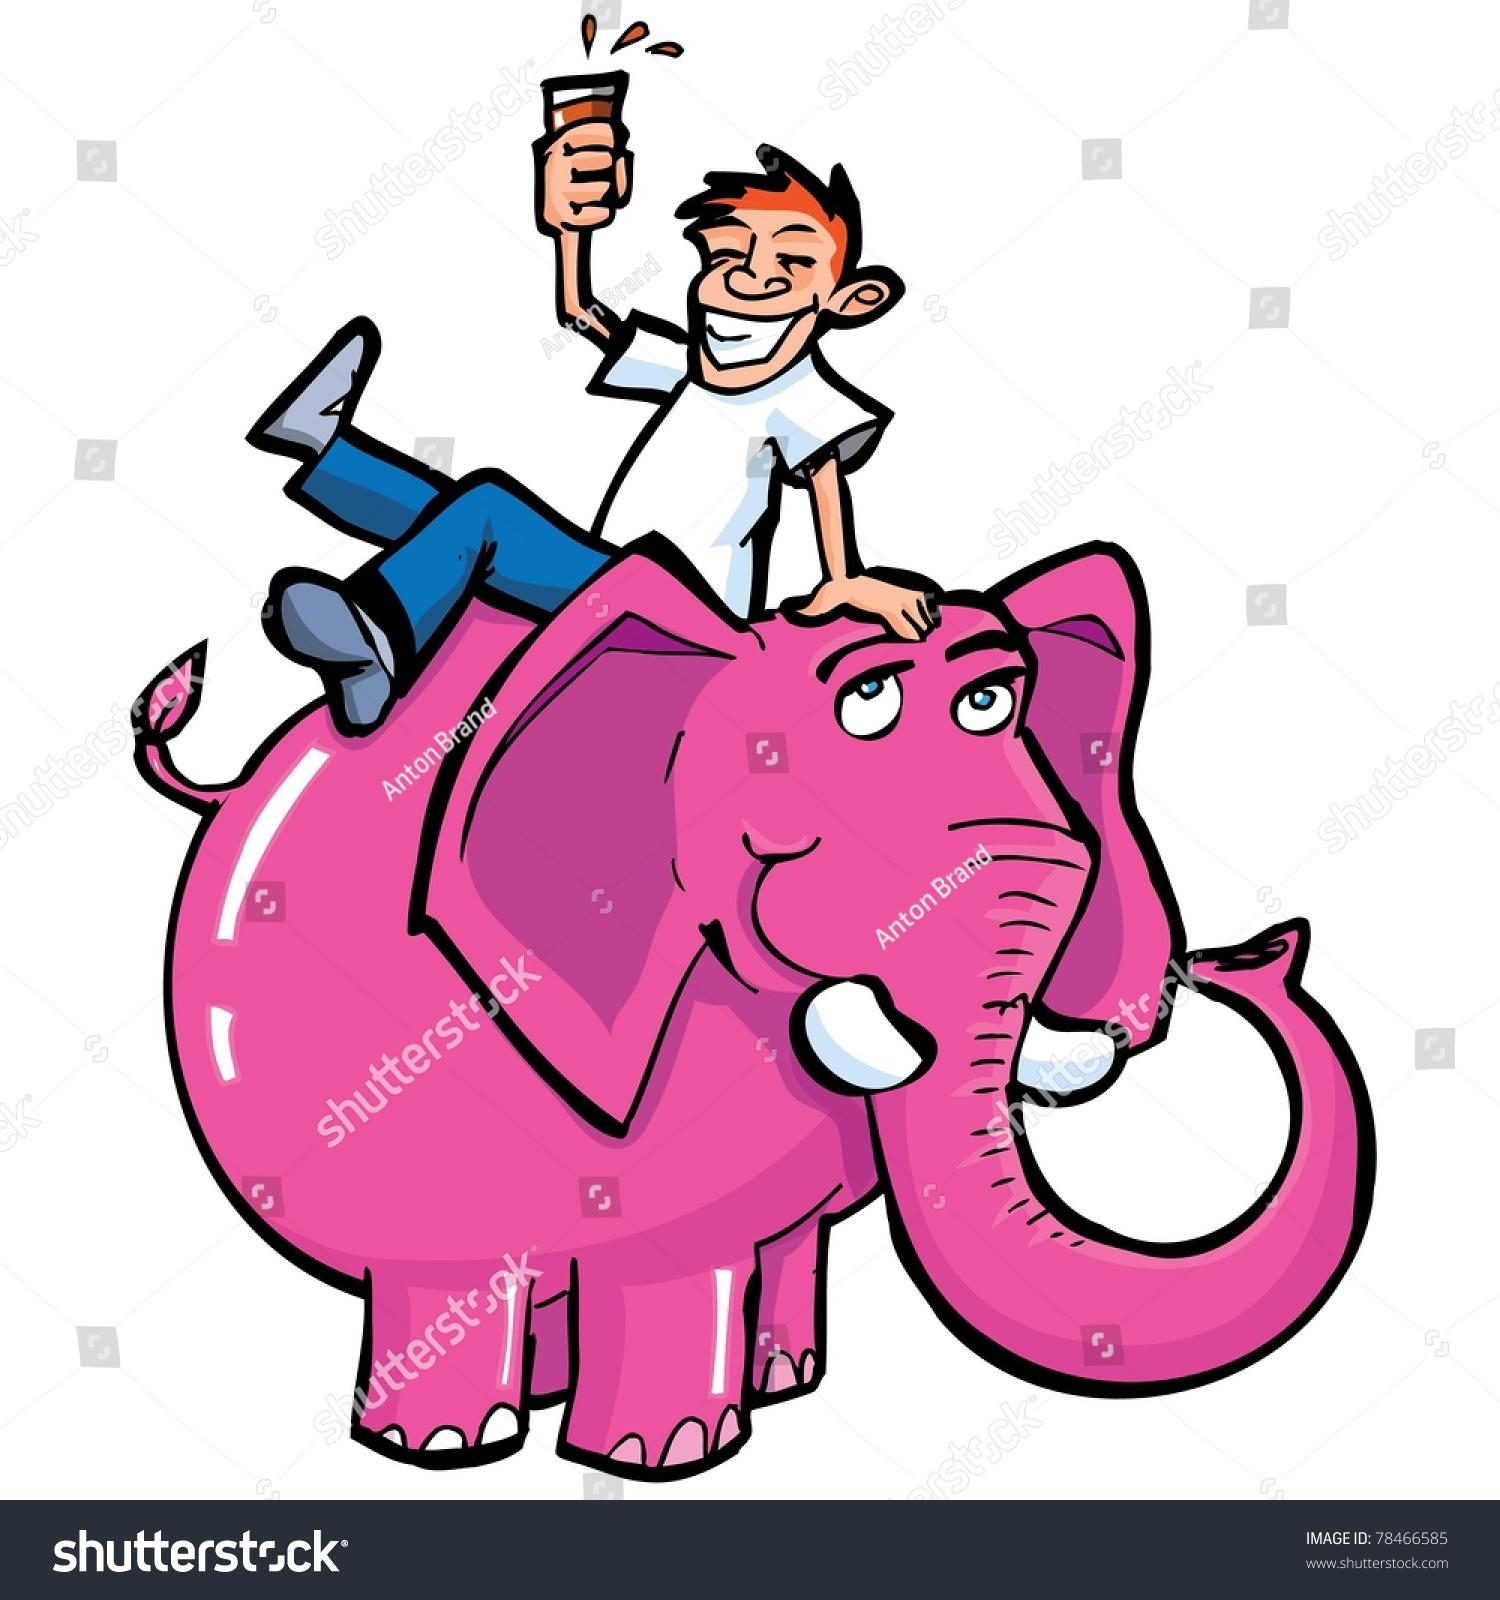 Cartoon Drunk Man Riding Pink Elephant Stock Vector ...